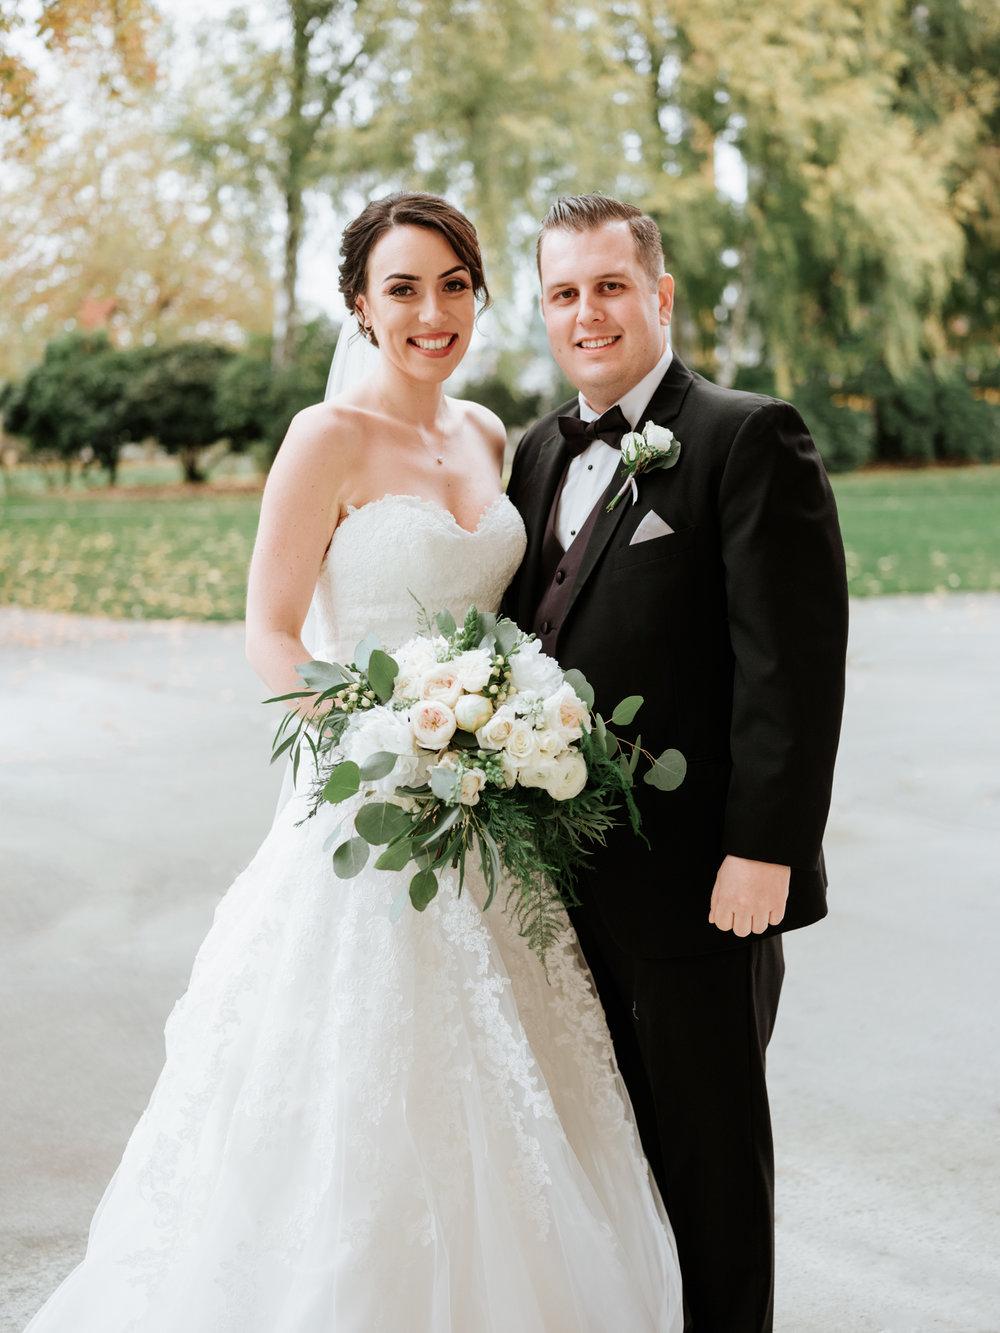 Stolen Glimpses Seattle Wedding Photographers 26.jpg